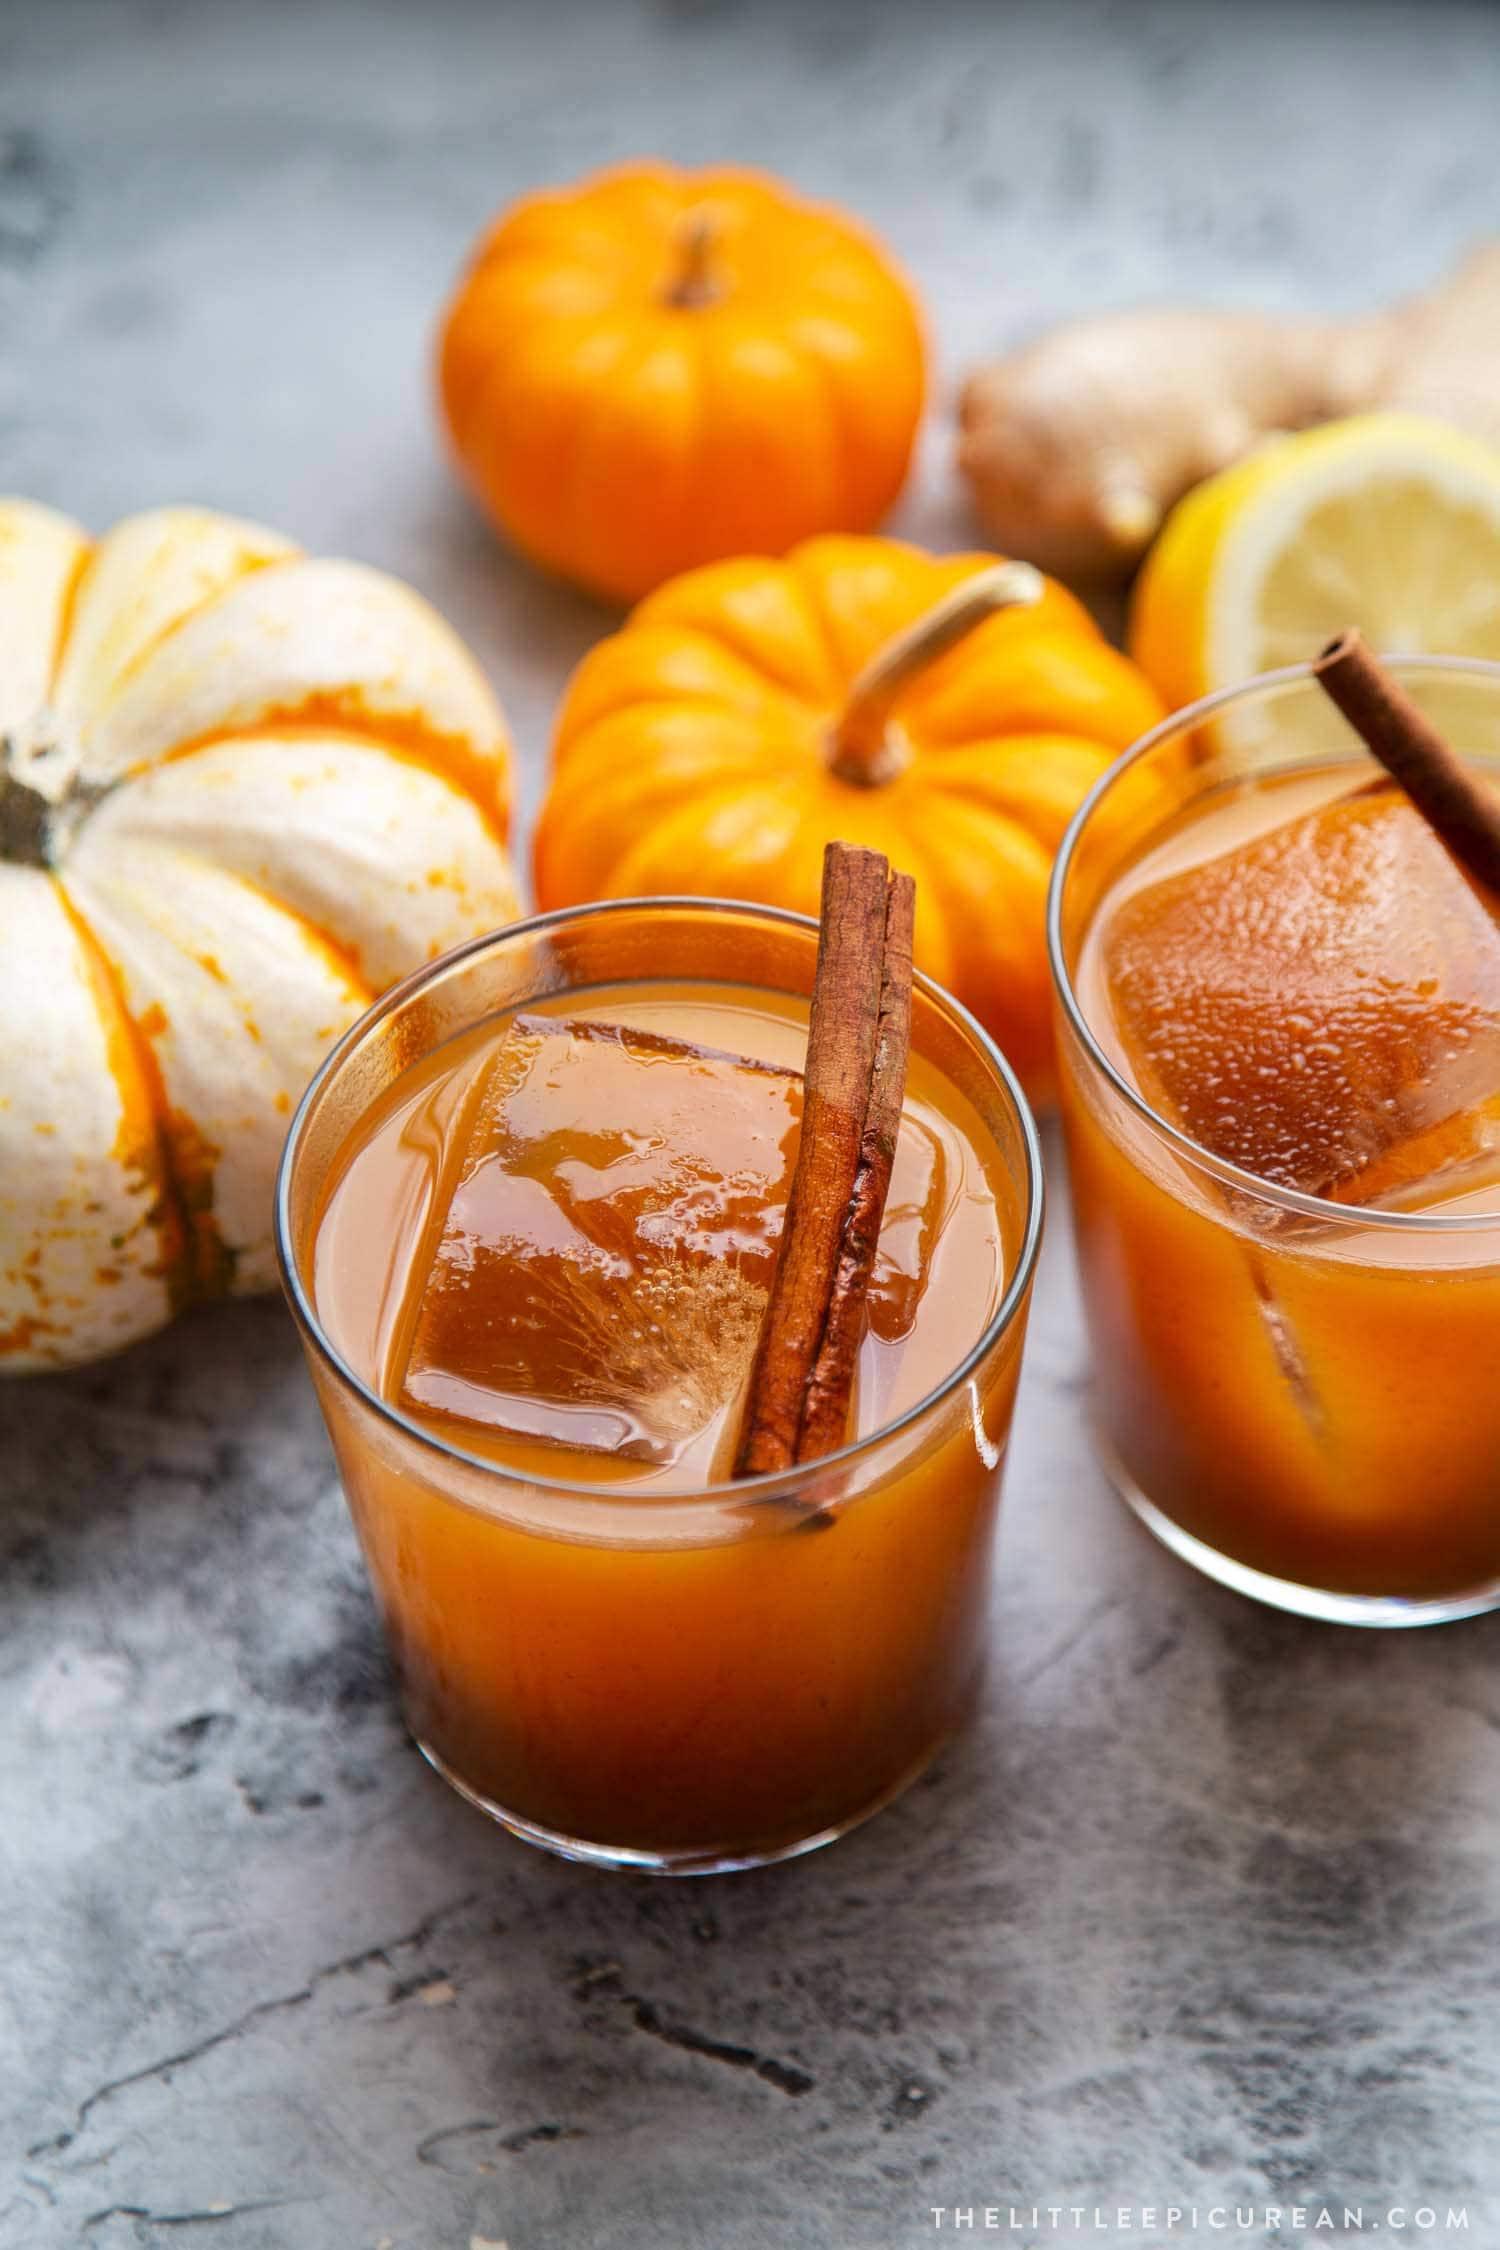 Pumpkin Bourbon Cocktail. This autumn harvest cocktail features warm spices, pumpkin butter, bourbon, and a pop of lemon juice. #cocktails #boozydrinks #holidays